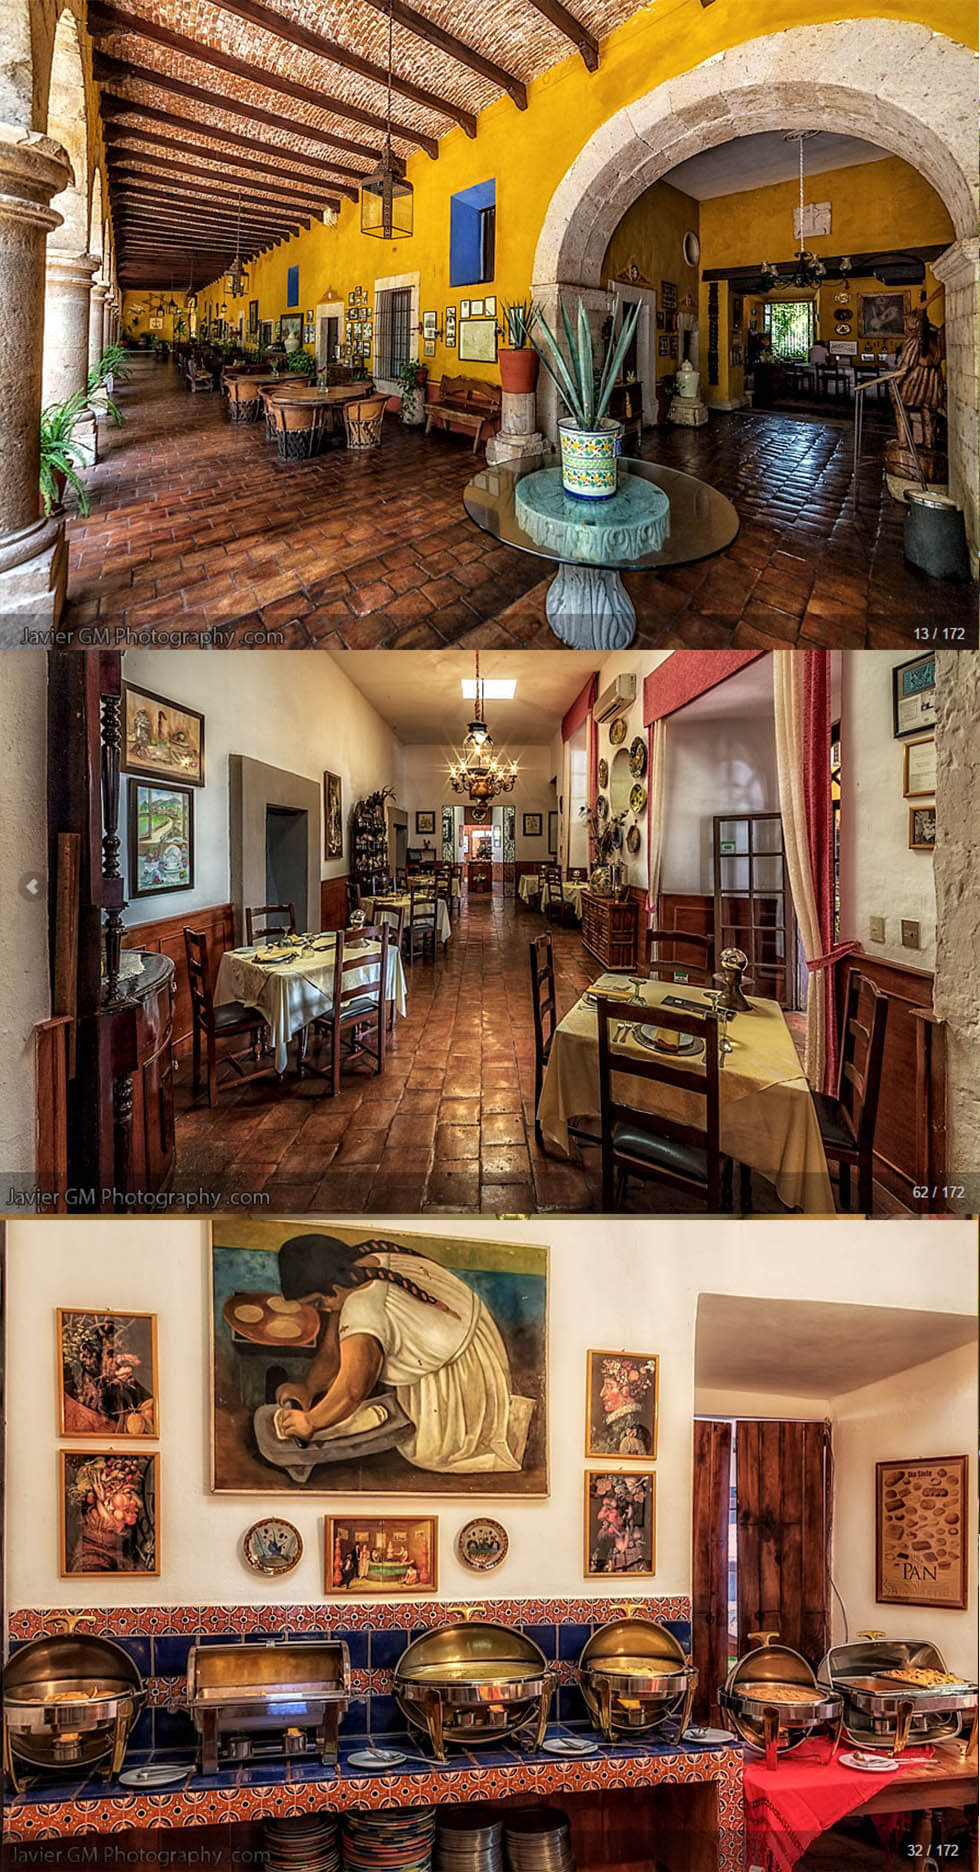 restaurantes-alexjumper-haciendaelcarmen